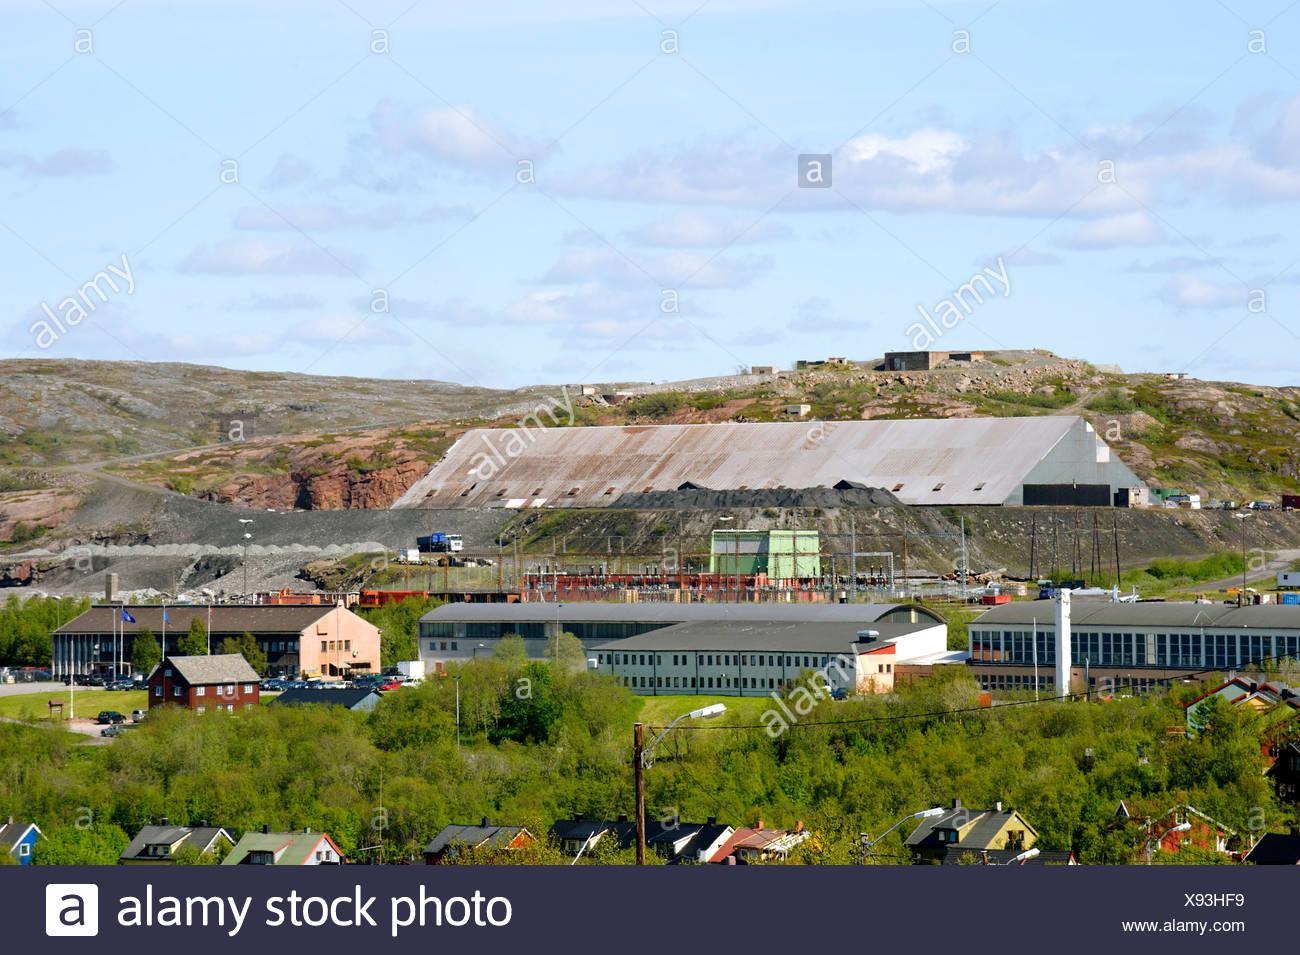 Eisenerz Abrichten Anlage, Kirkenes, Norwegen, Skandinavien, Europa Stockbild